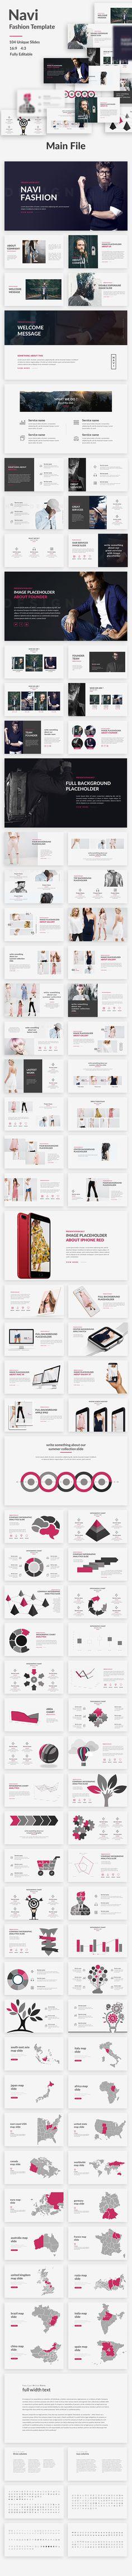 Navi - Fashion Powerpoint Template - PowerPoint Templates Presentation Templates